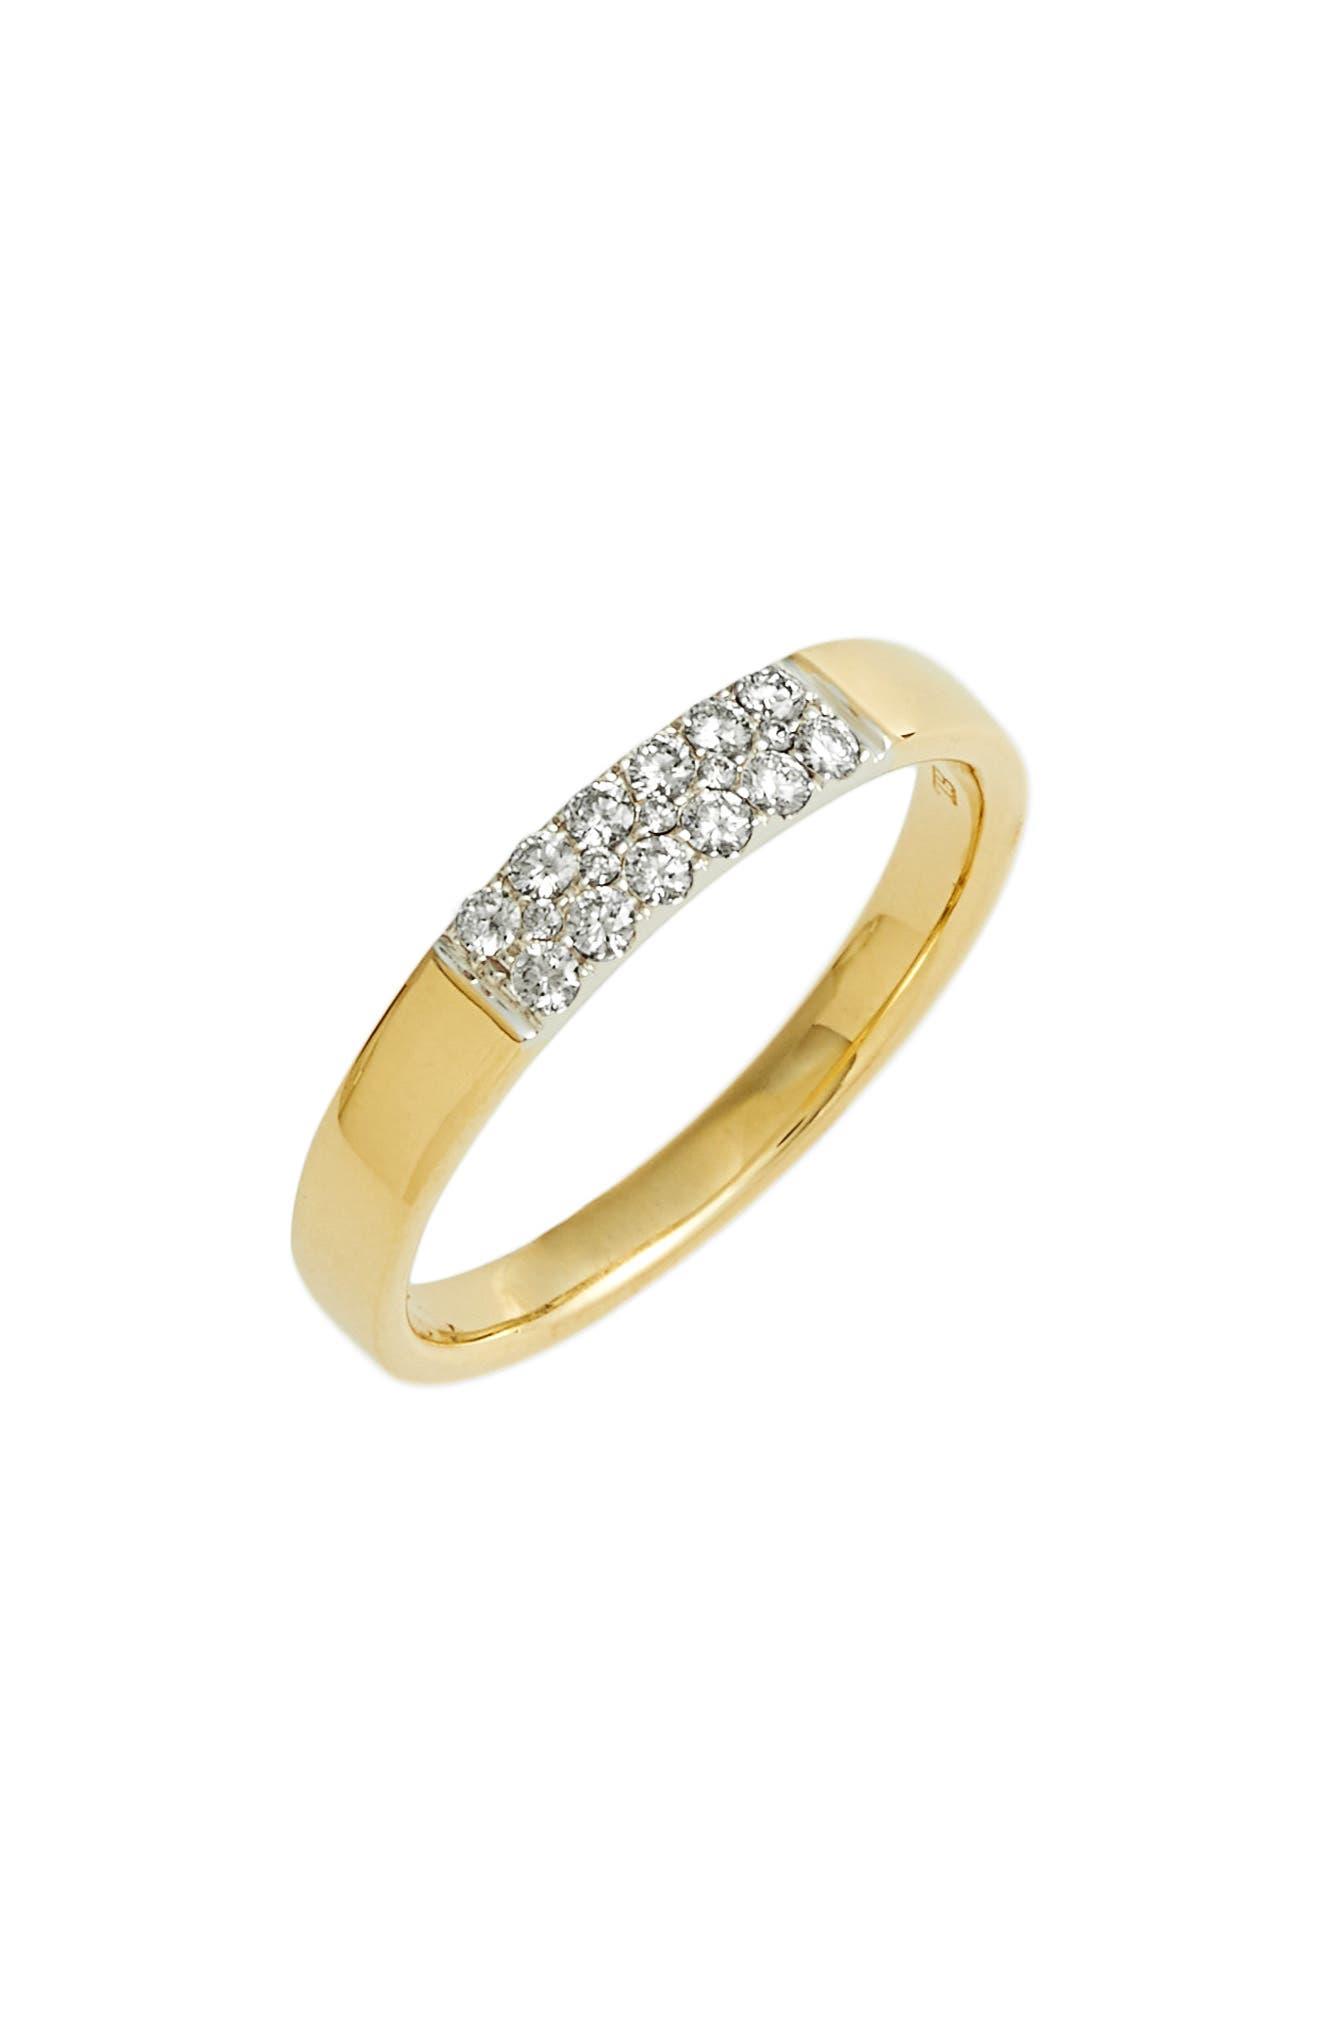 Kiera Diamond Stacking Ring,                             Main thumbnail 1, color,                             YELLOW GOLD/ WHITE GOLD